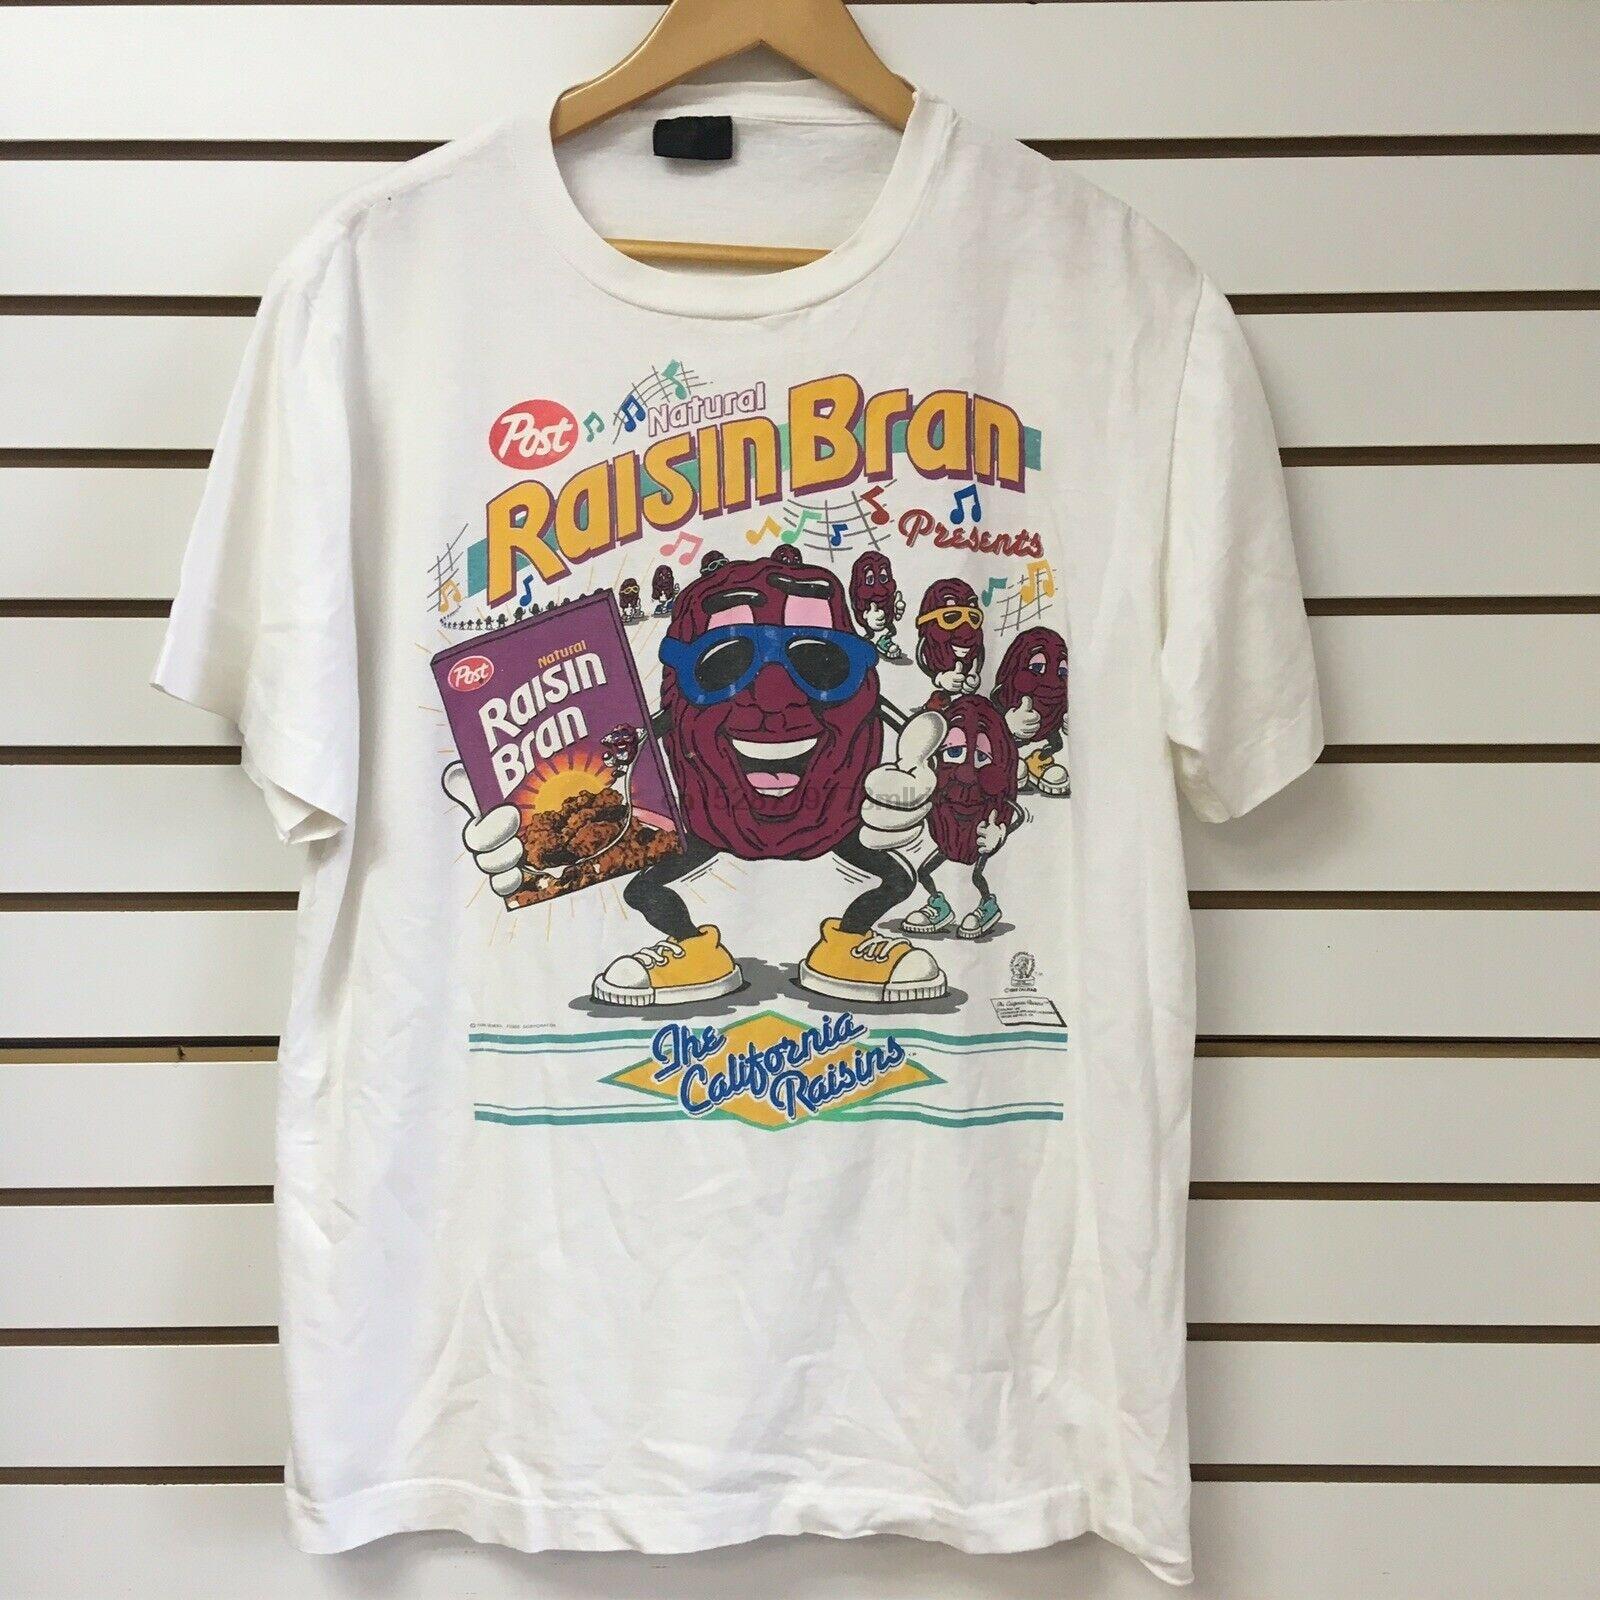 Vintage California Rozijnen T Shirt Maat Xl Raisin Bran Post Granen 1988 Mode Korte Mouw Zwart T-shirt